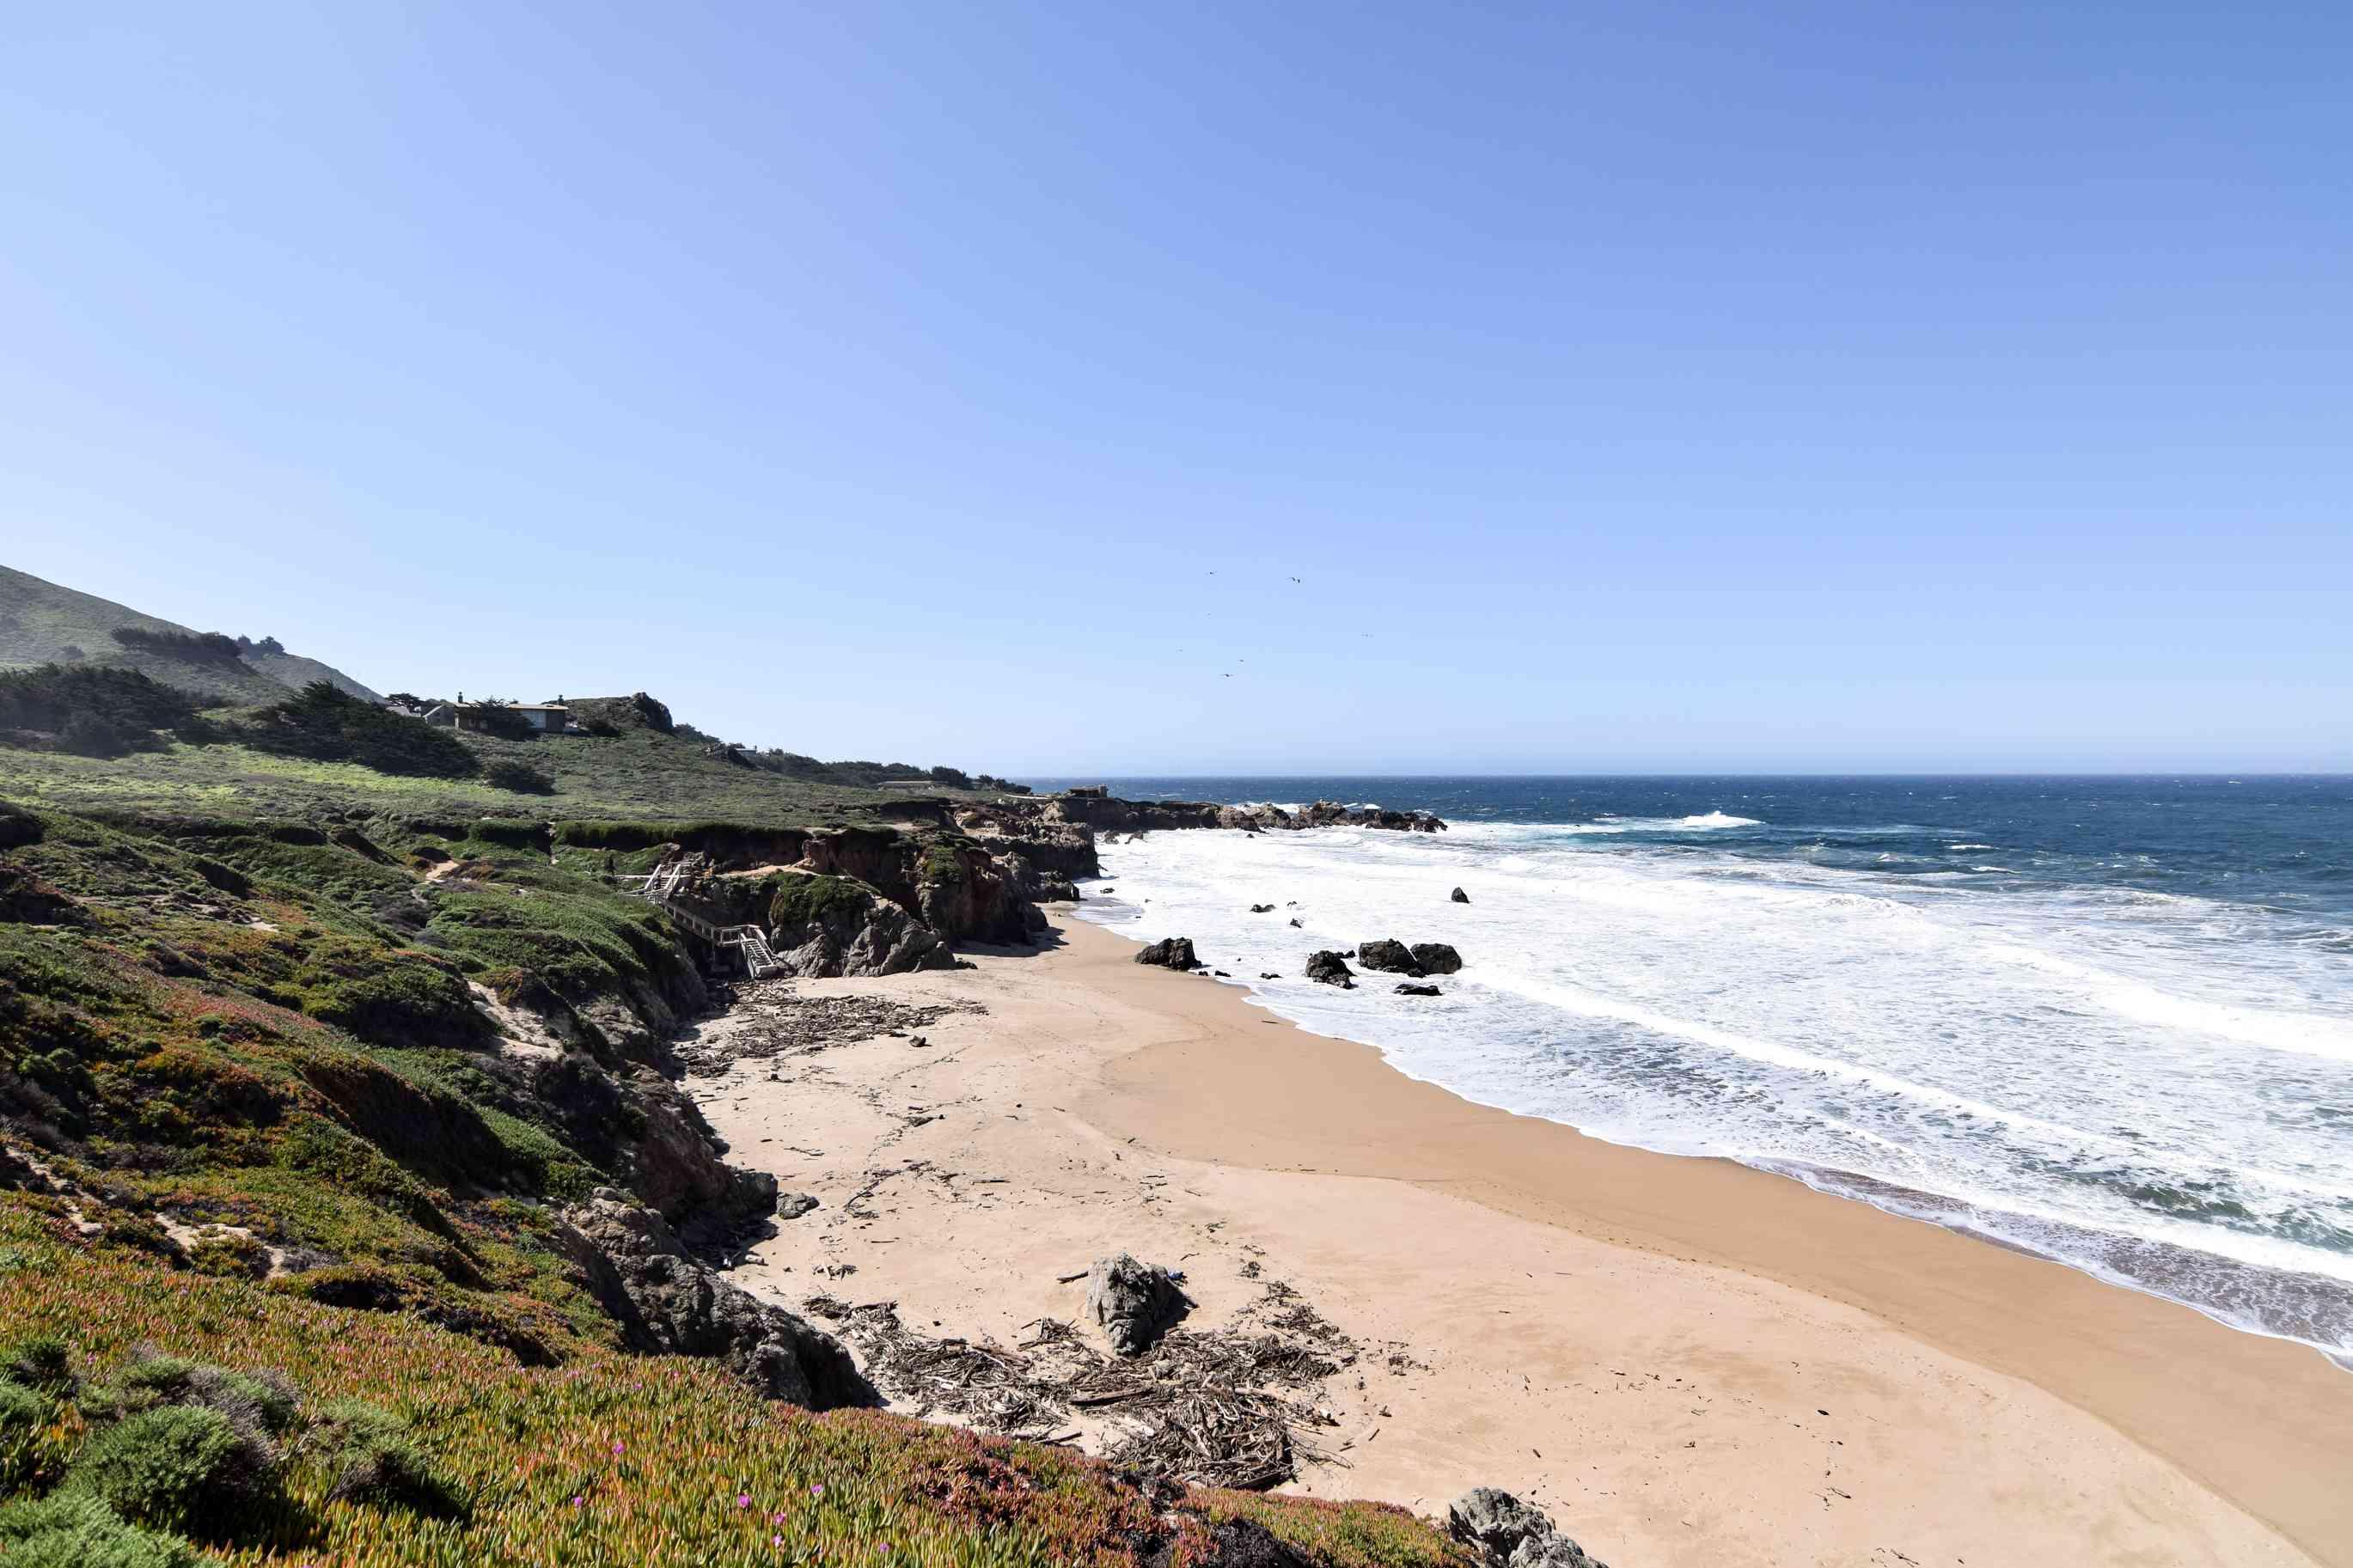 Beach in Carmel